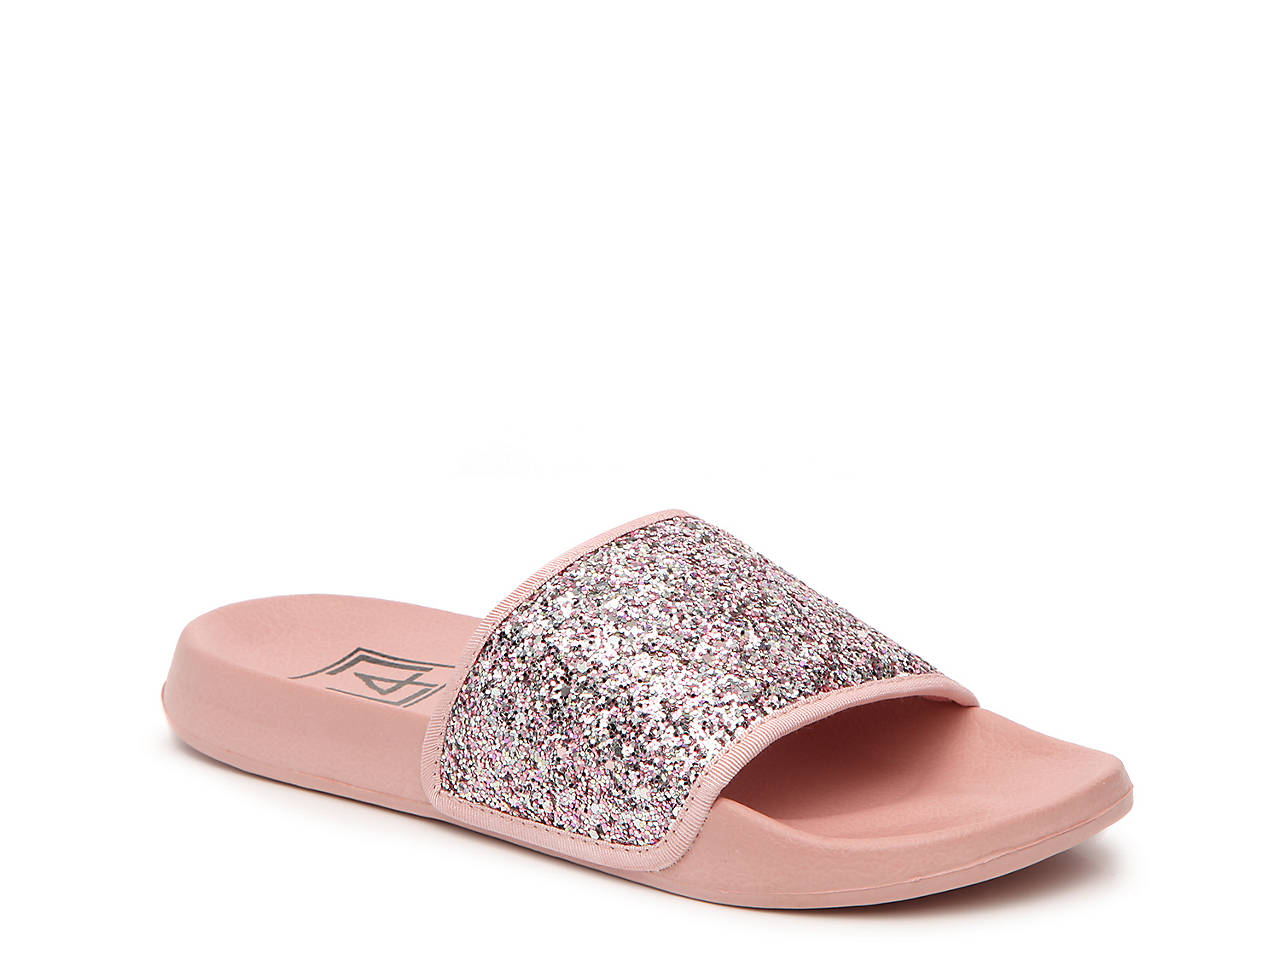 5a350af4a84335 LFL Sparkle Slide Sandal Women s Shoes